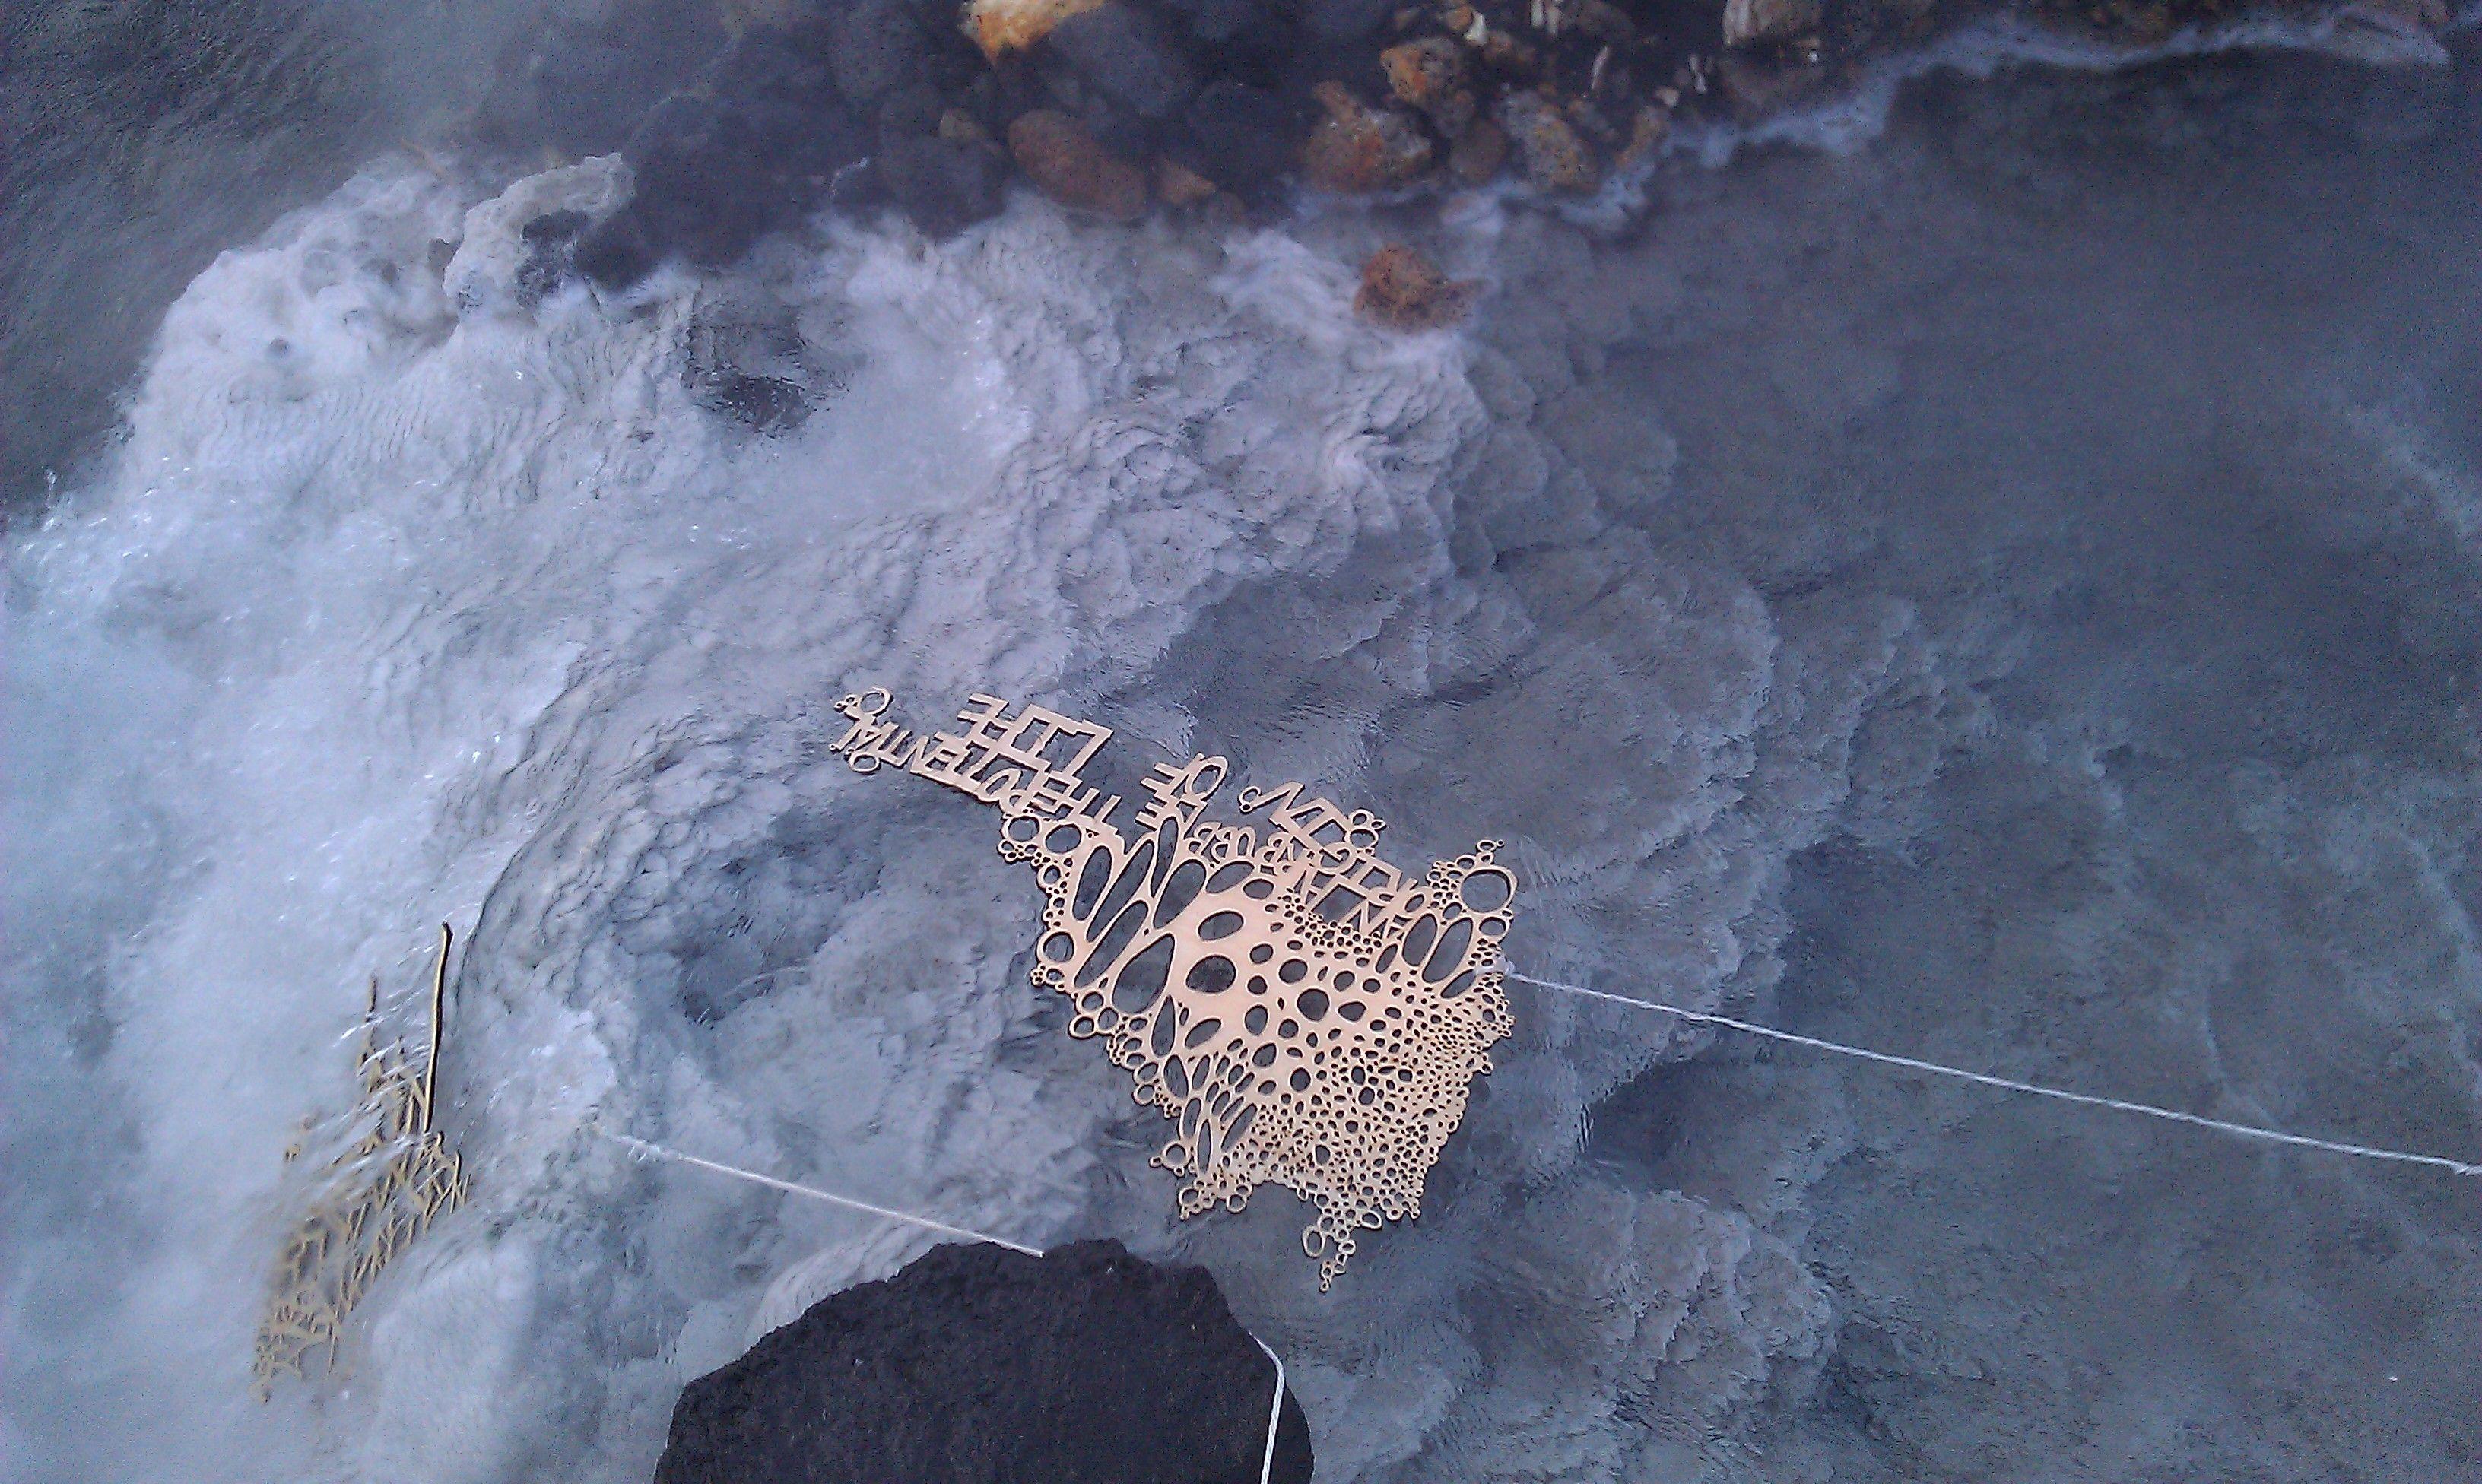 Ilana Halperin: Geothermally Occurring Sculptures